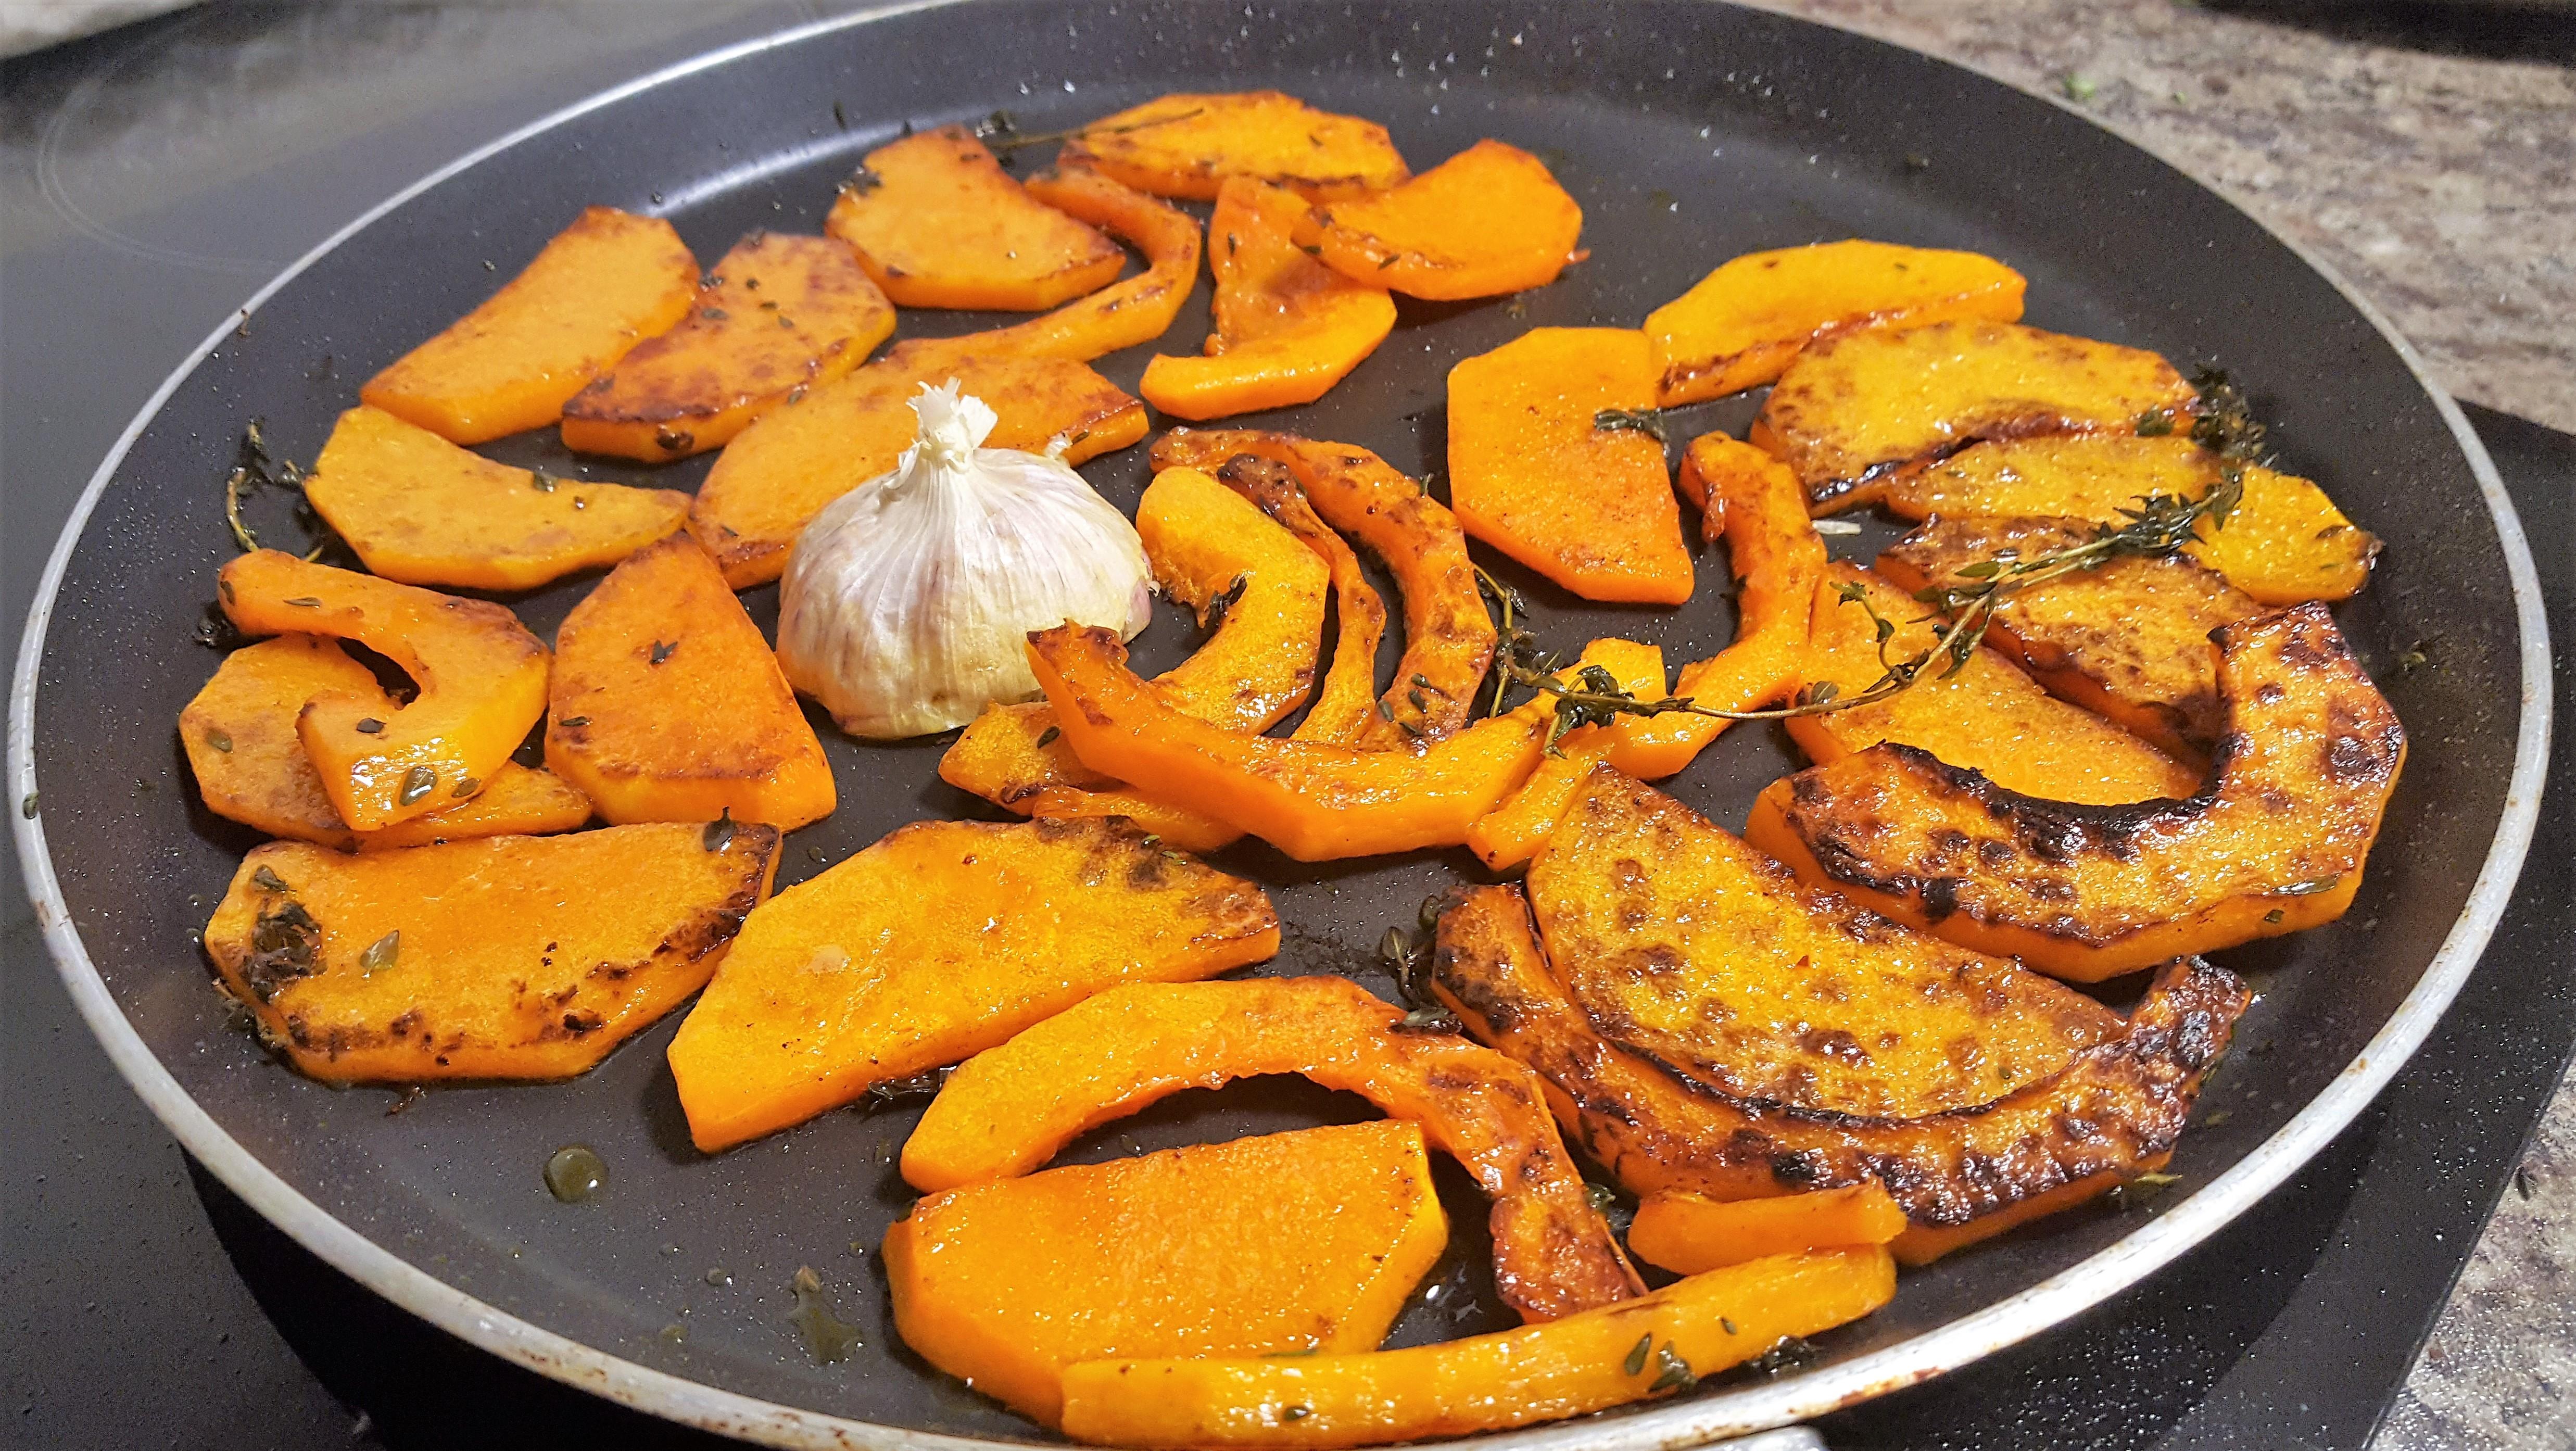 How to pan roast butternut squash Vegetarian Snacks dontask4salt